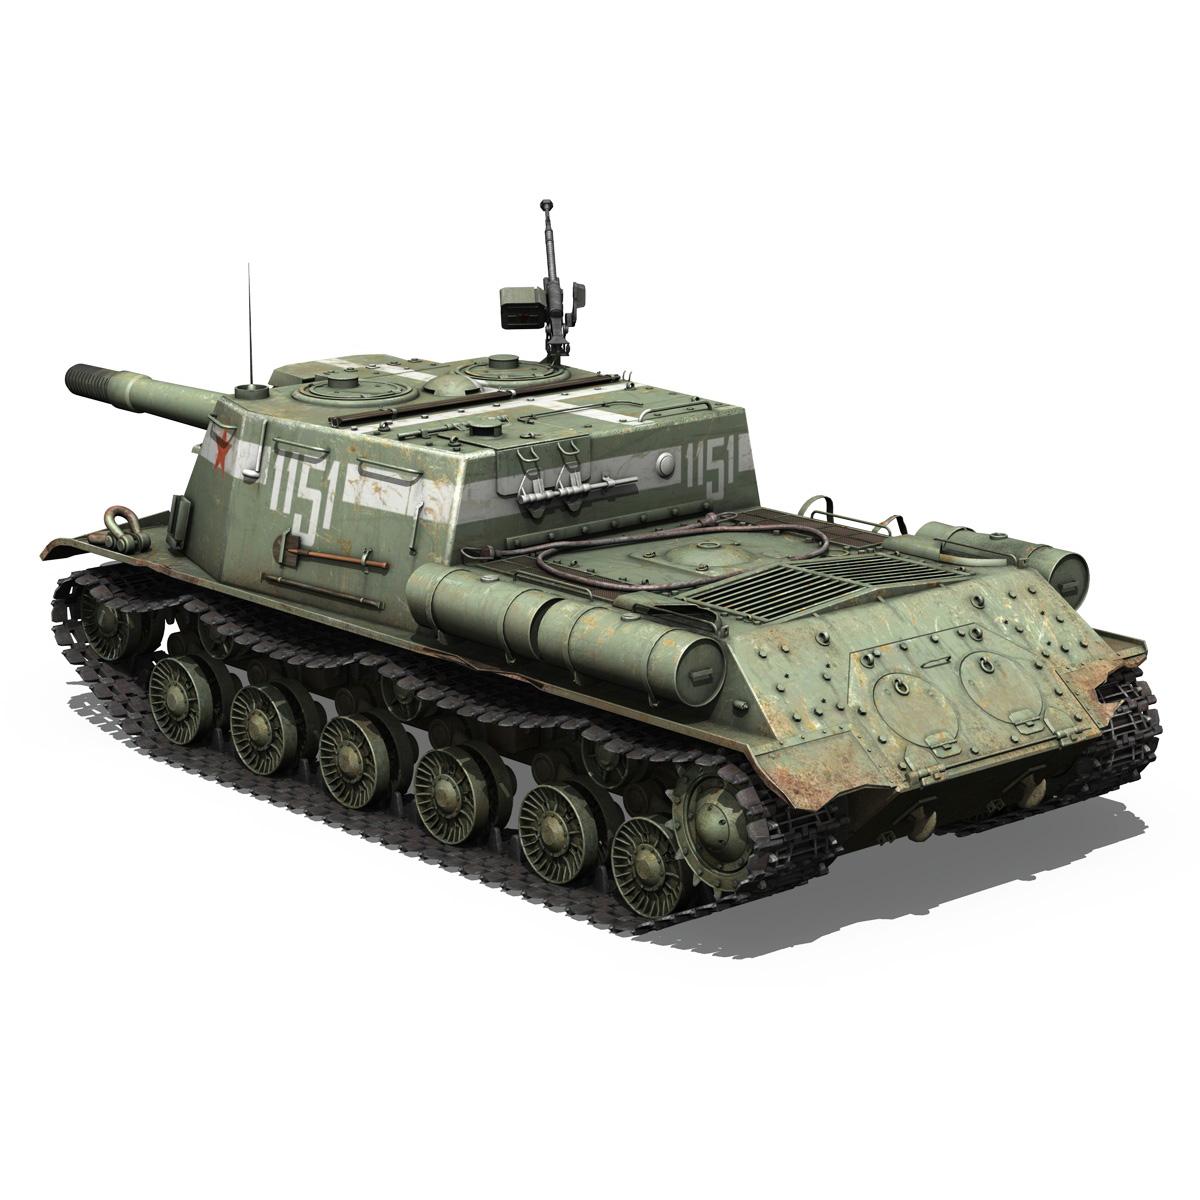 isu 152 soviet heavy self propelled gun 3d model 3ds fbx c4d lwo obj 187528